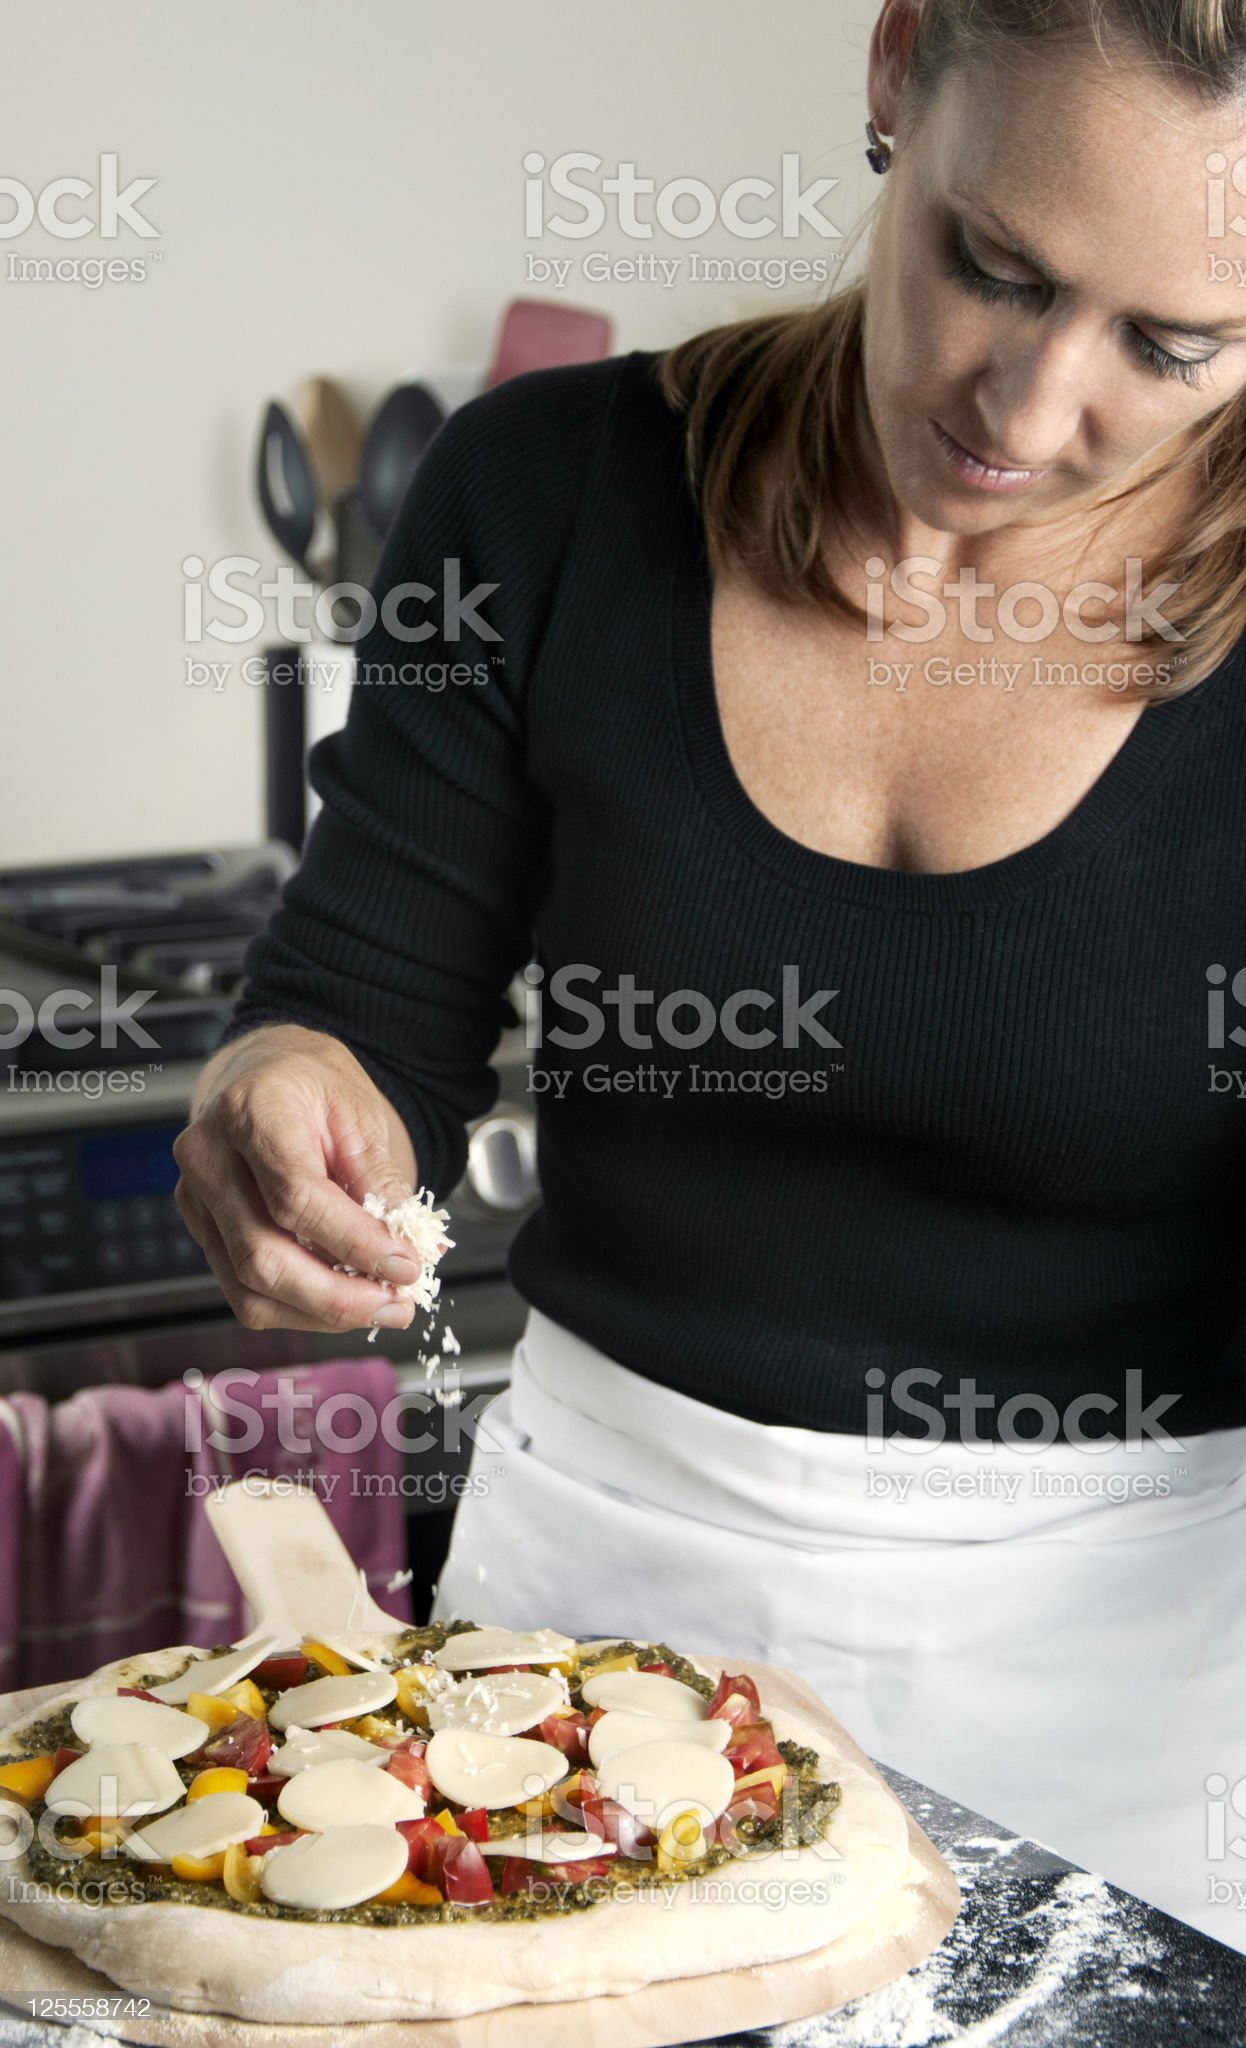 Female Chef Preparing Pizza royalty-free stock photo